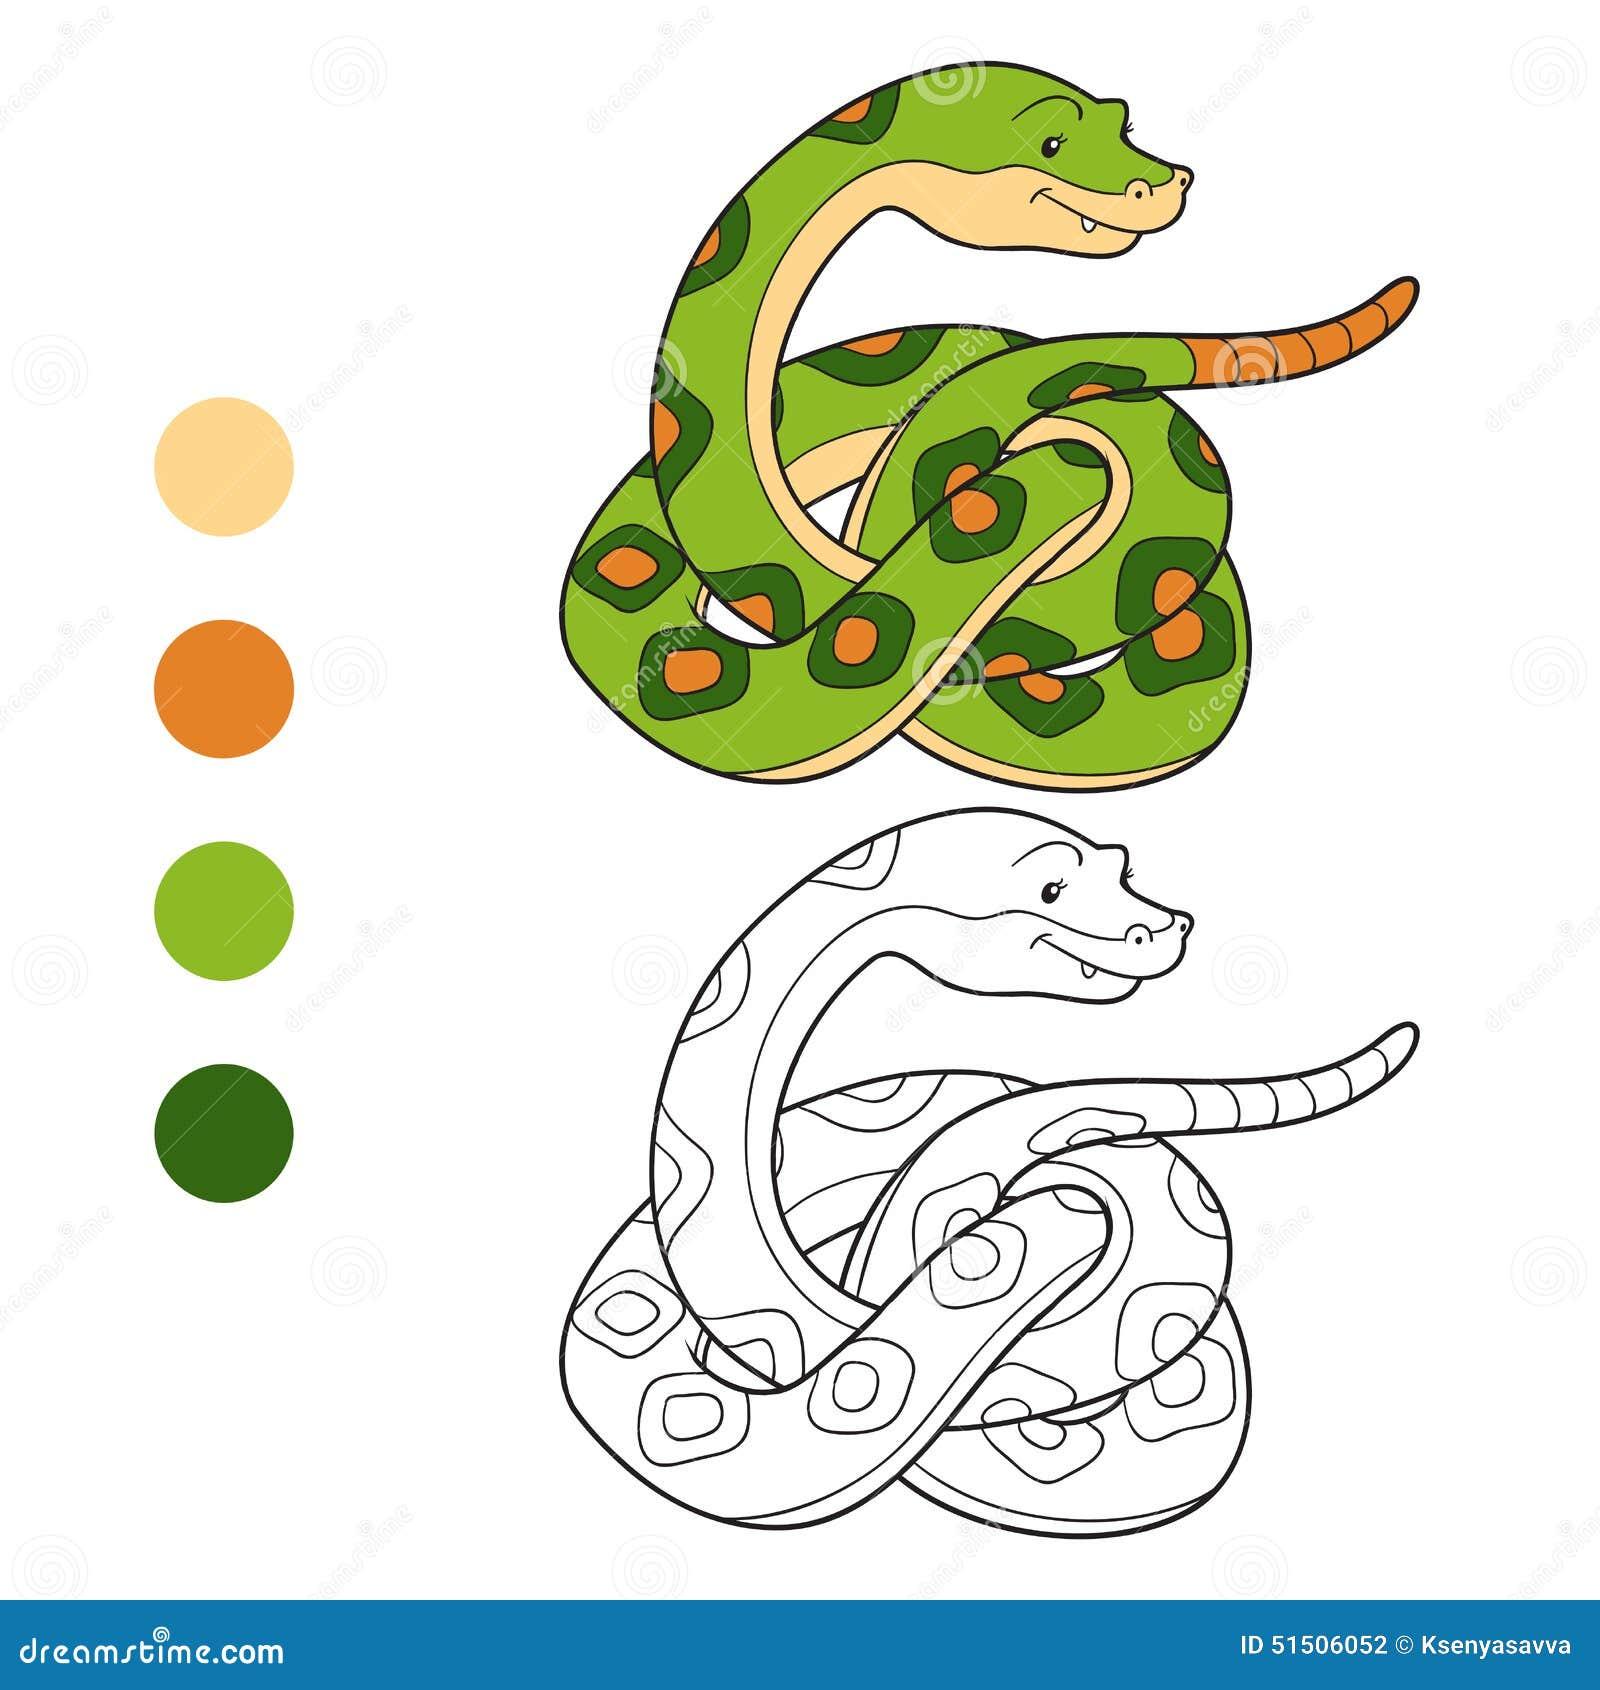 Green snake cartoon royalty free stock image image 19462406 - Libro Da Colorare Serpente Fotografia Stock